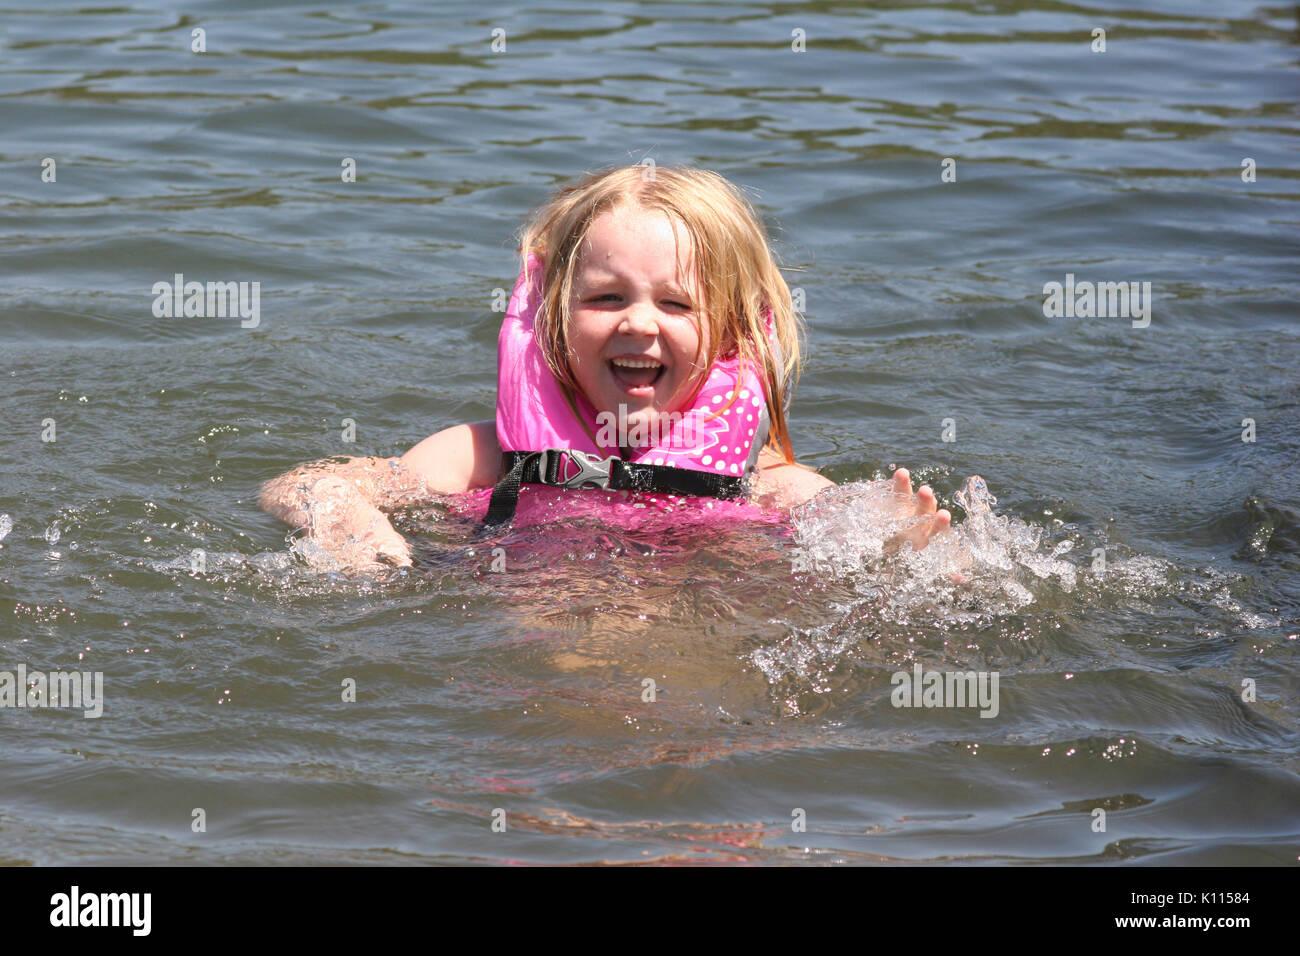 GIRL (6) WEARING LIFE JACKET AND SWIMMING IN LAKE SACRAMENTO COUNTY, CALIFORNIA - Stock Image